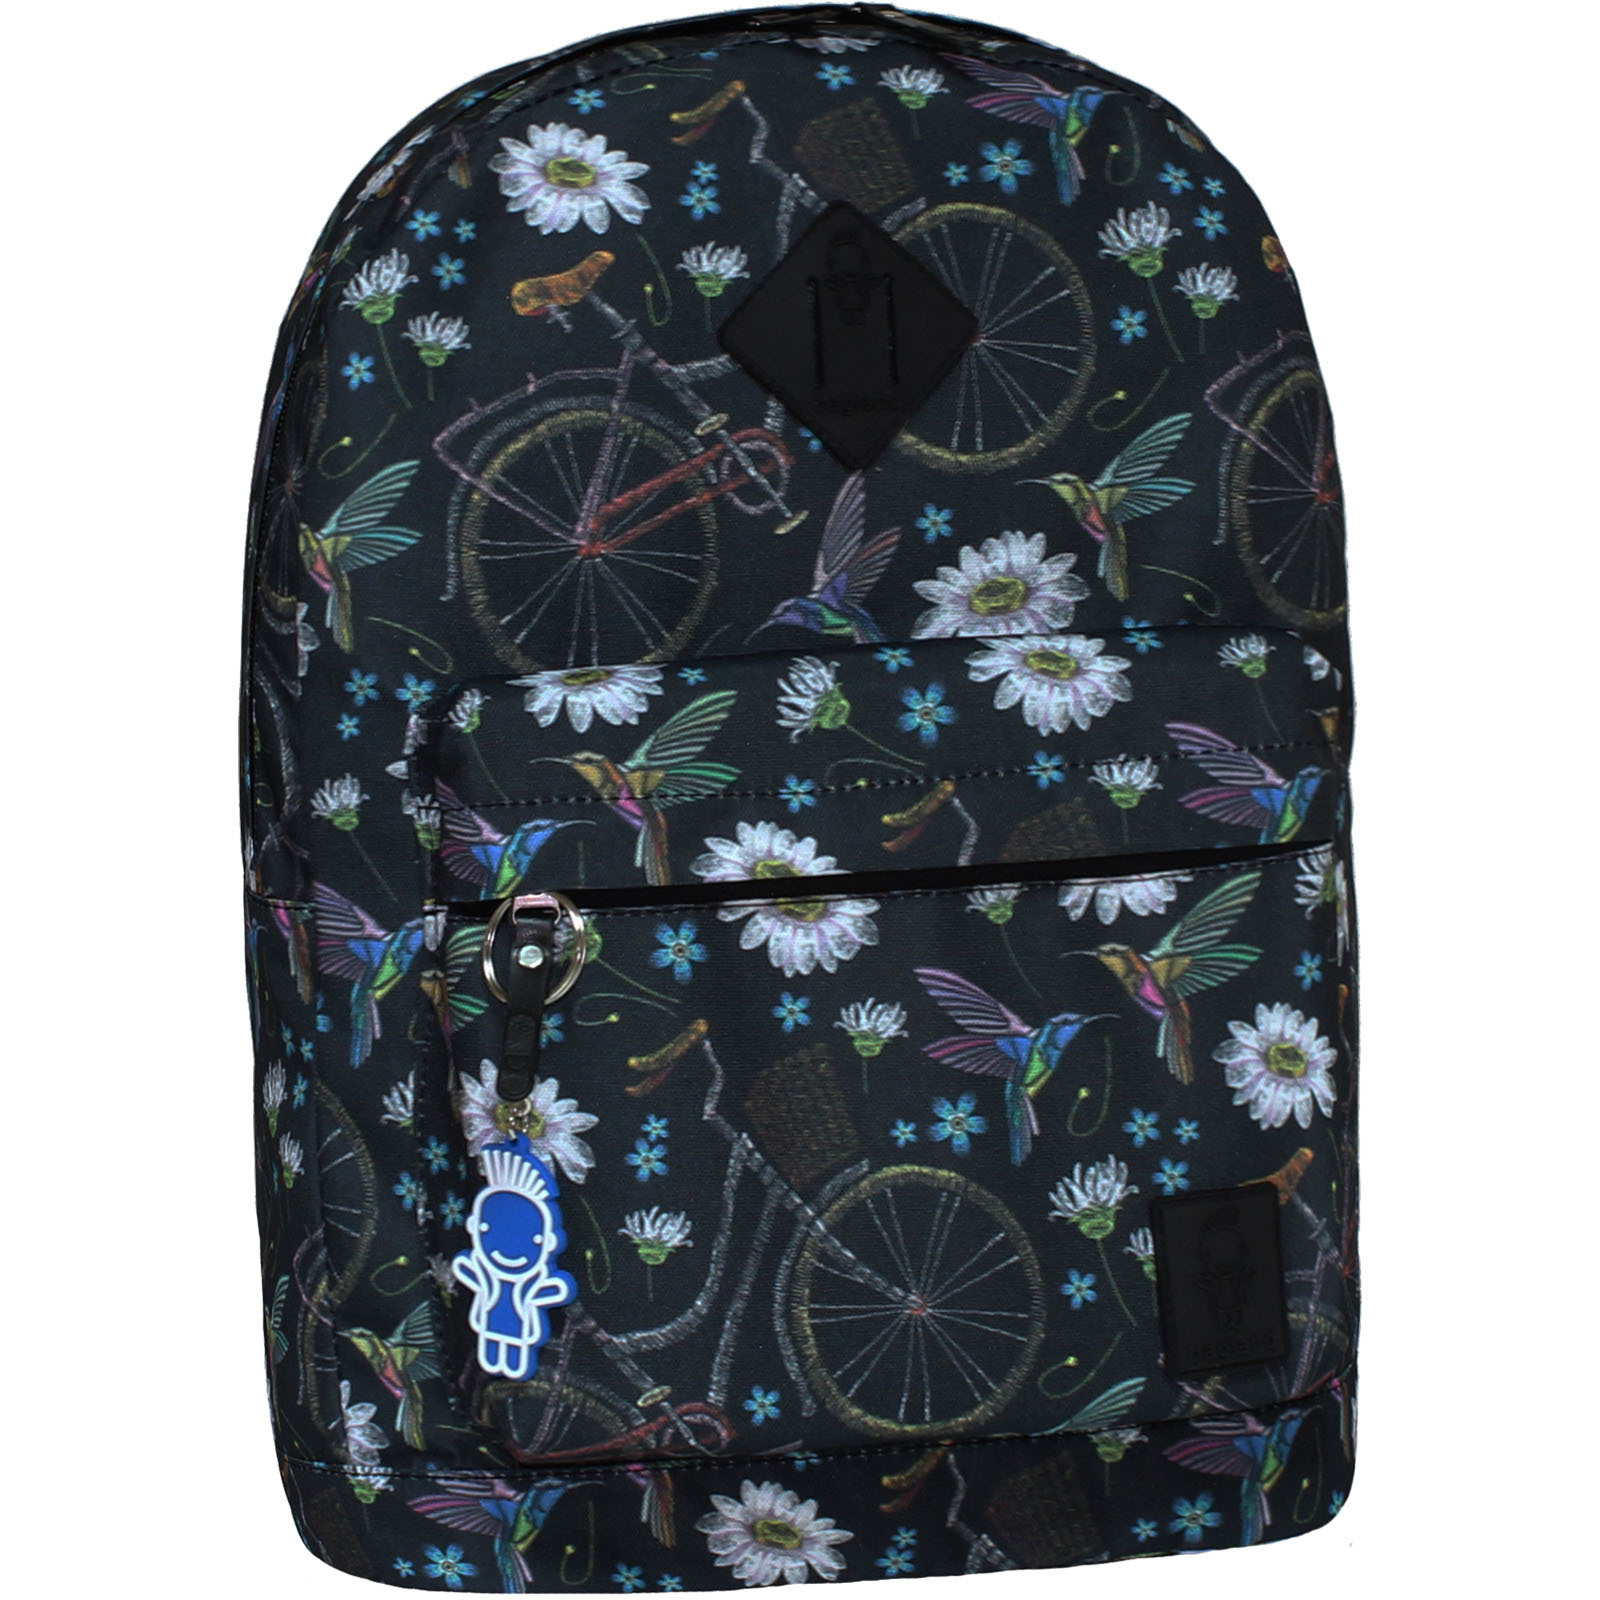 Рюкзак Bagland Молодежный (дизайн) 17 л. сублимация 194 (00533664)